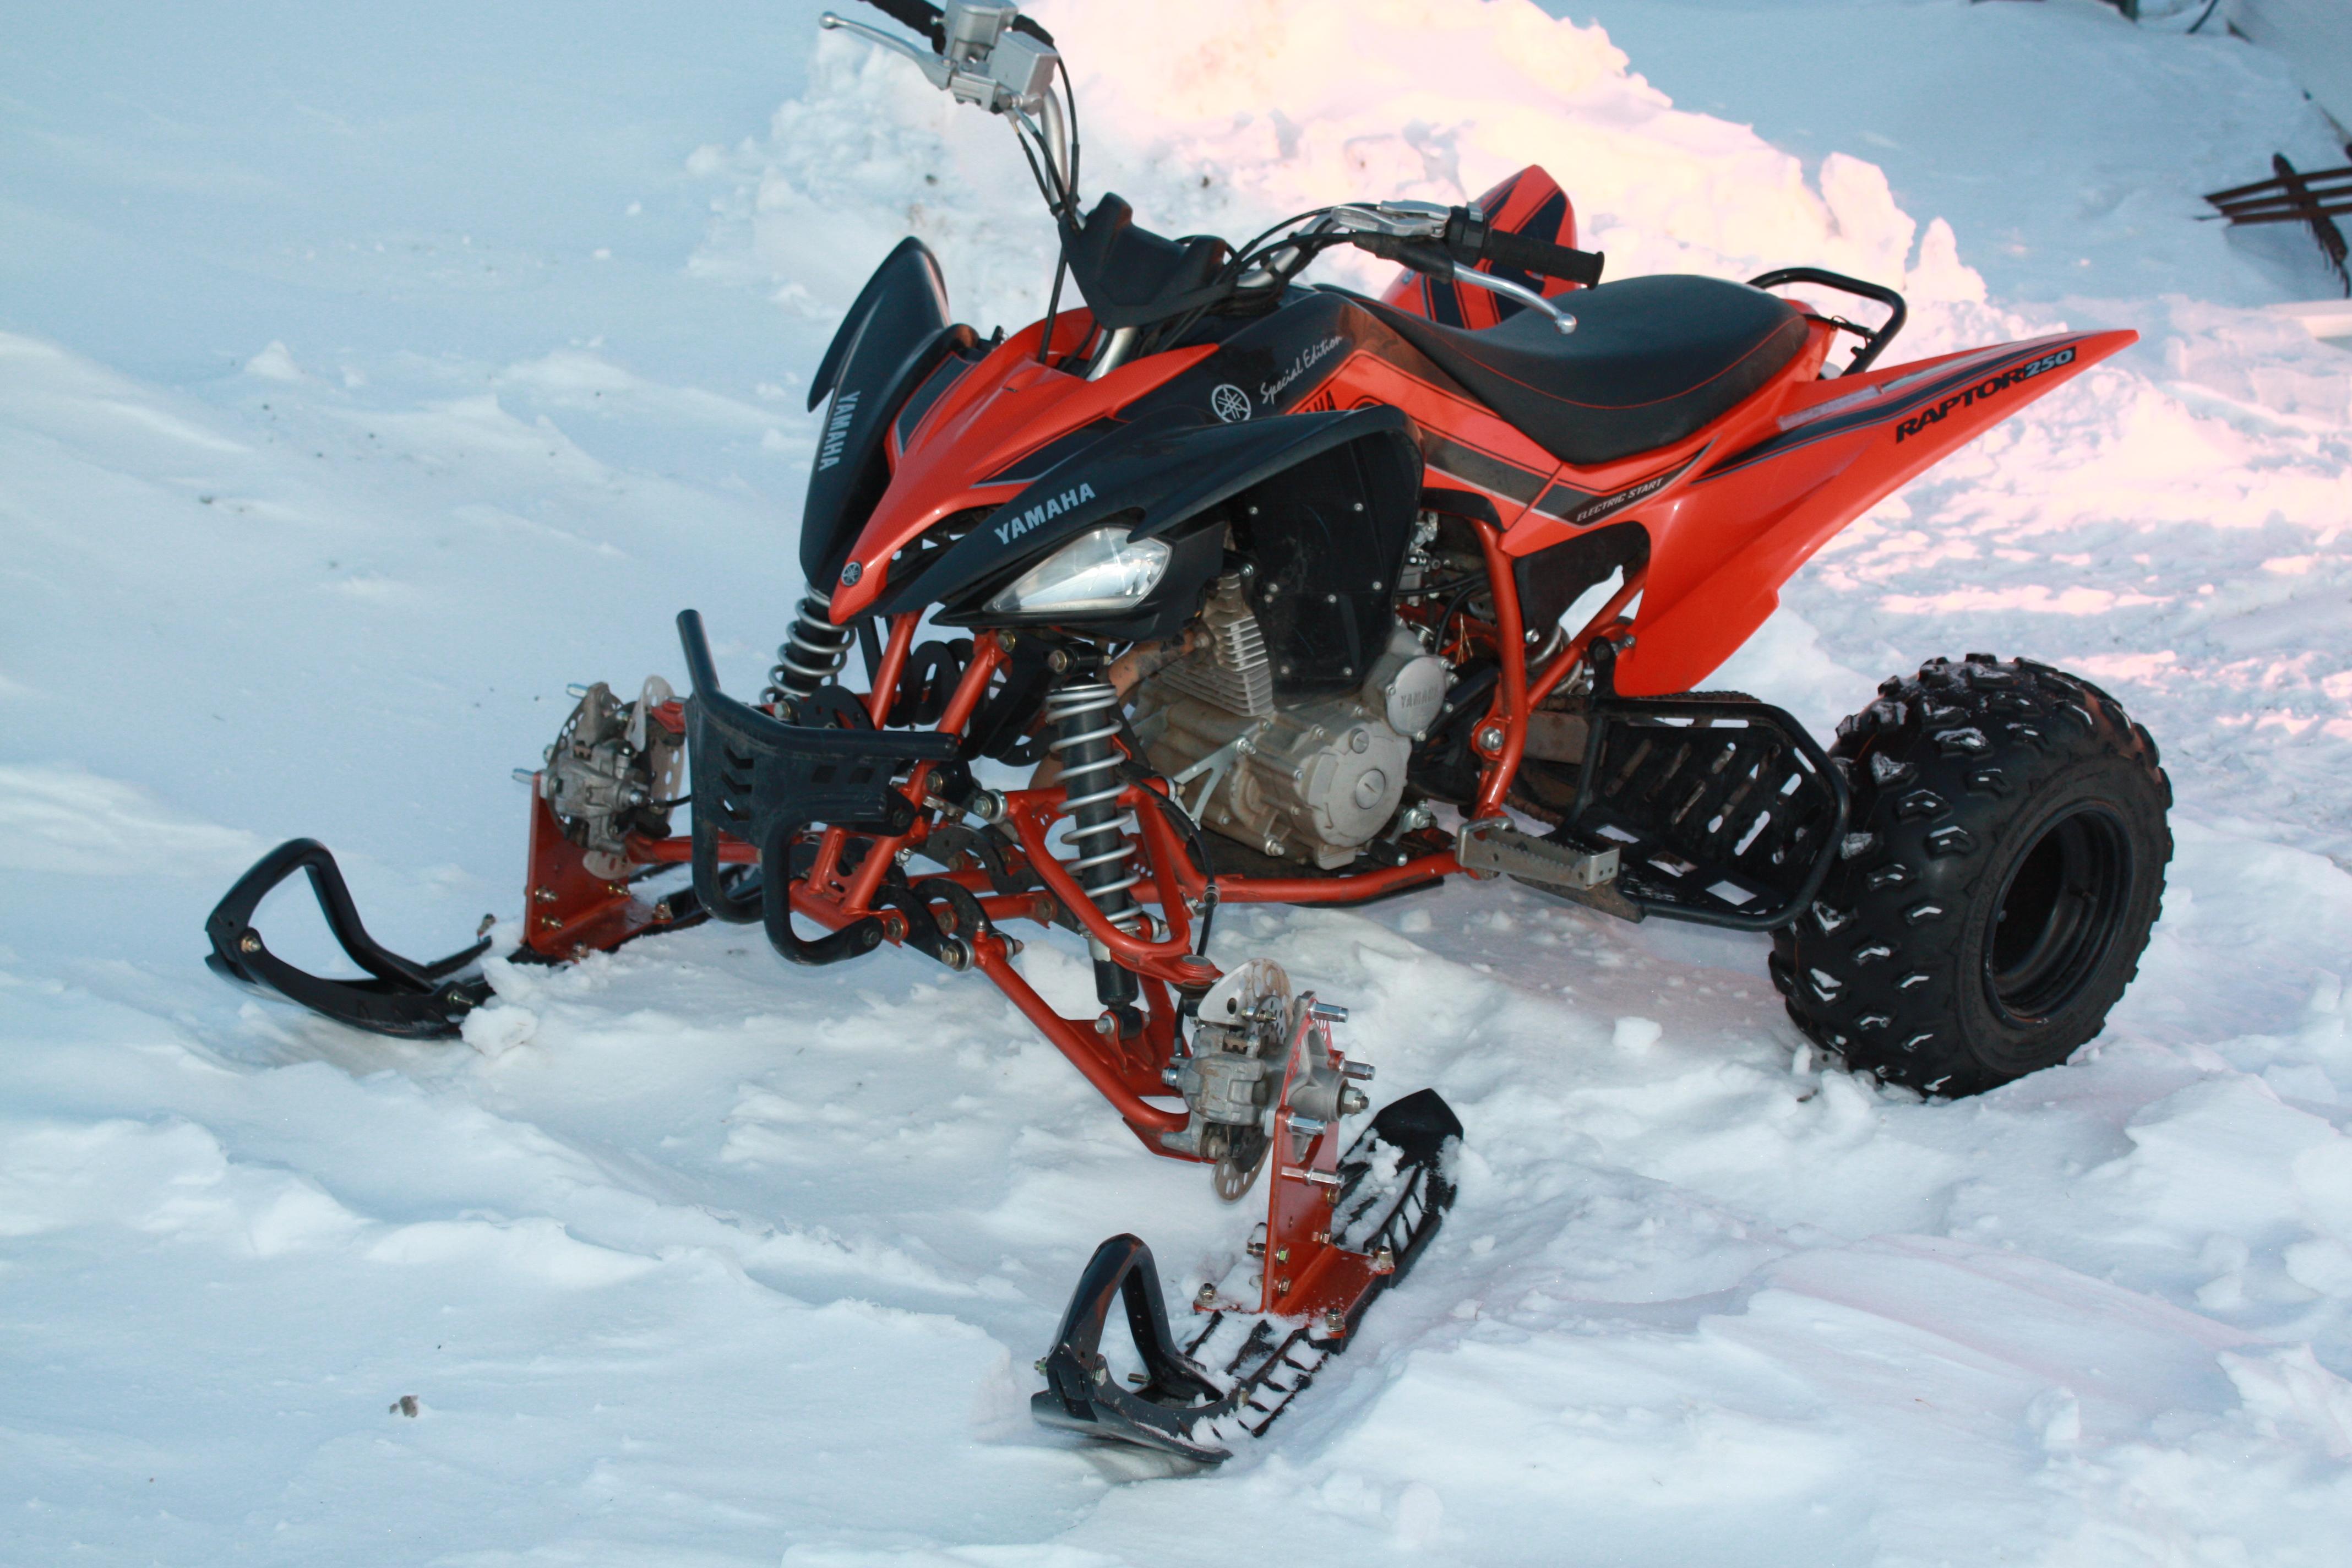 Yamaha Raptor Atv Quad Offroad Motorbike Bike Dirtbike Snowmobile